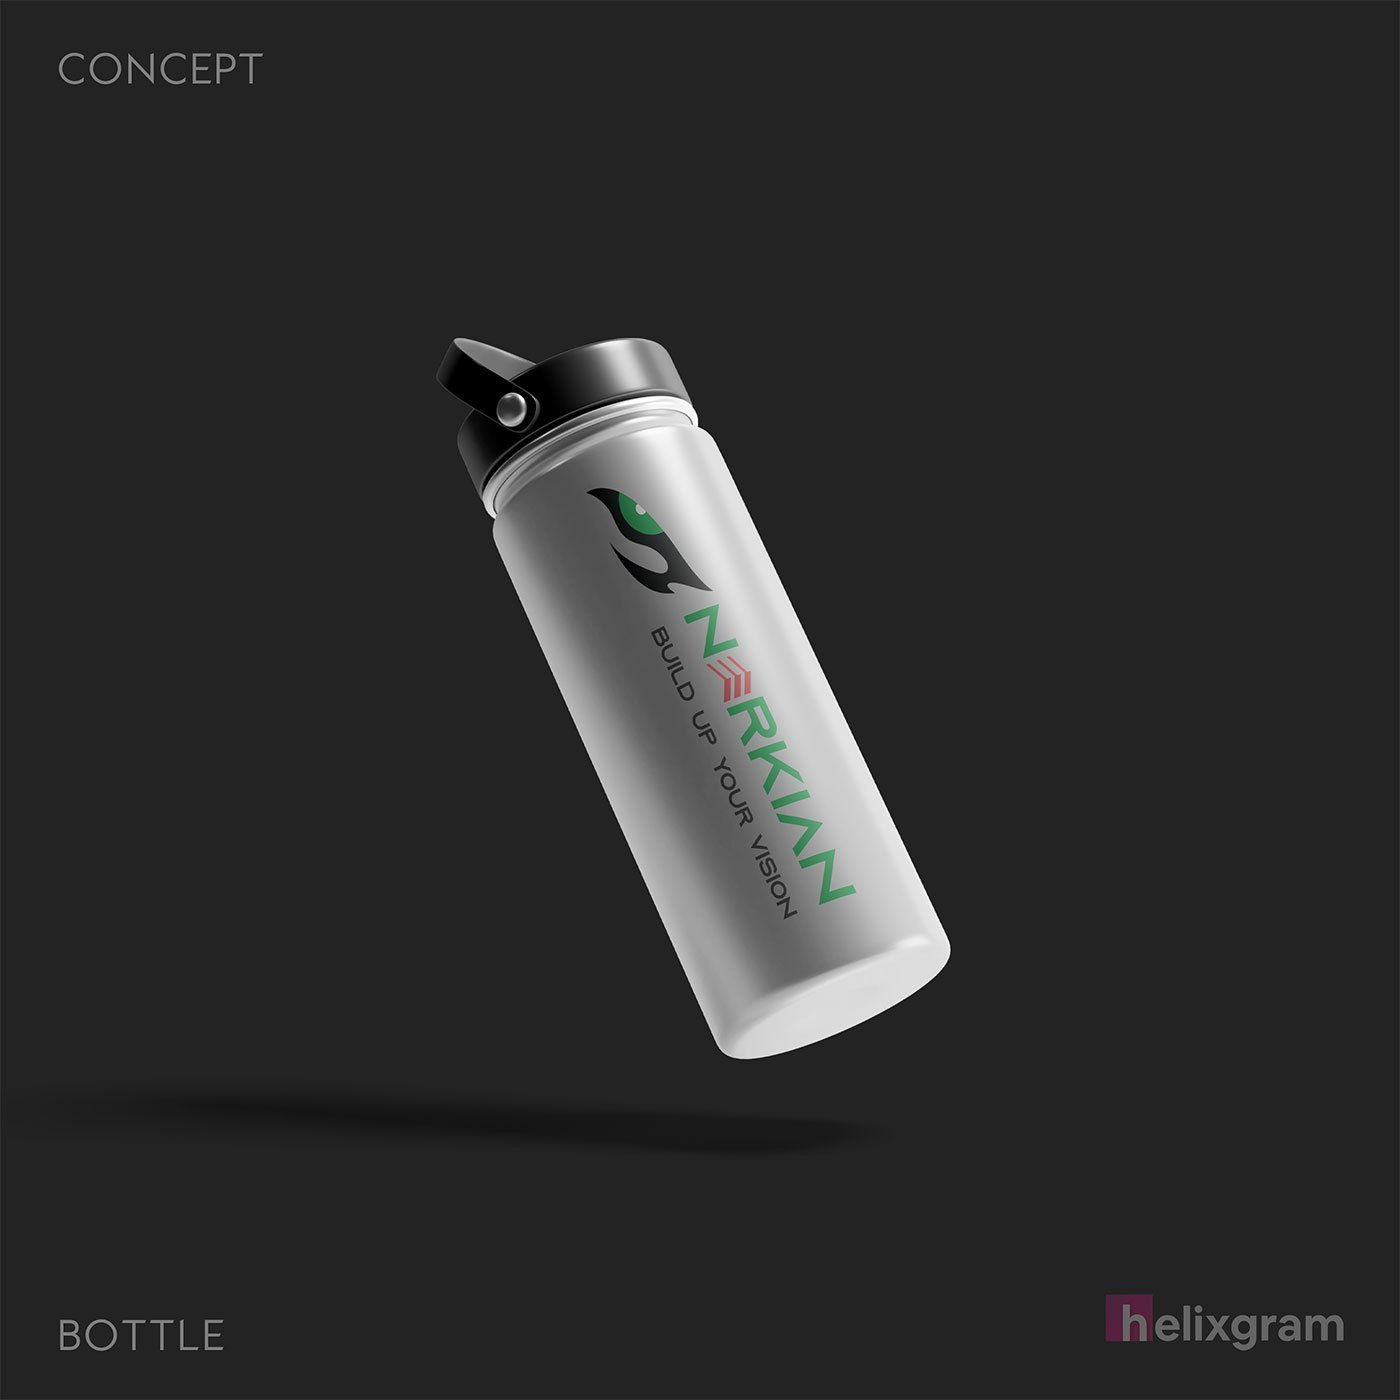 Brand-Identity-Water-bottle-Narkian-design-visual-identity-design-package-corporate-identity-design-logo-design-flyer-poster-book-cover-design-web-design-digital-advertising-Helixgram